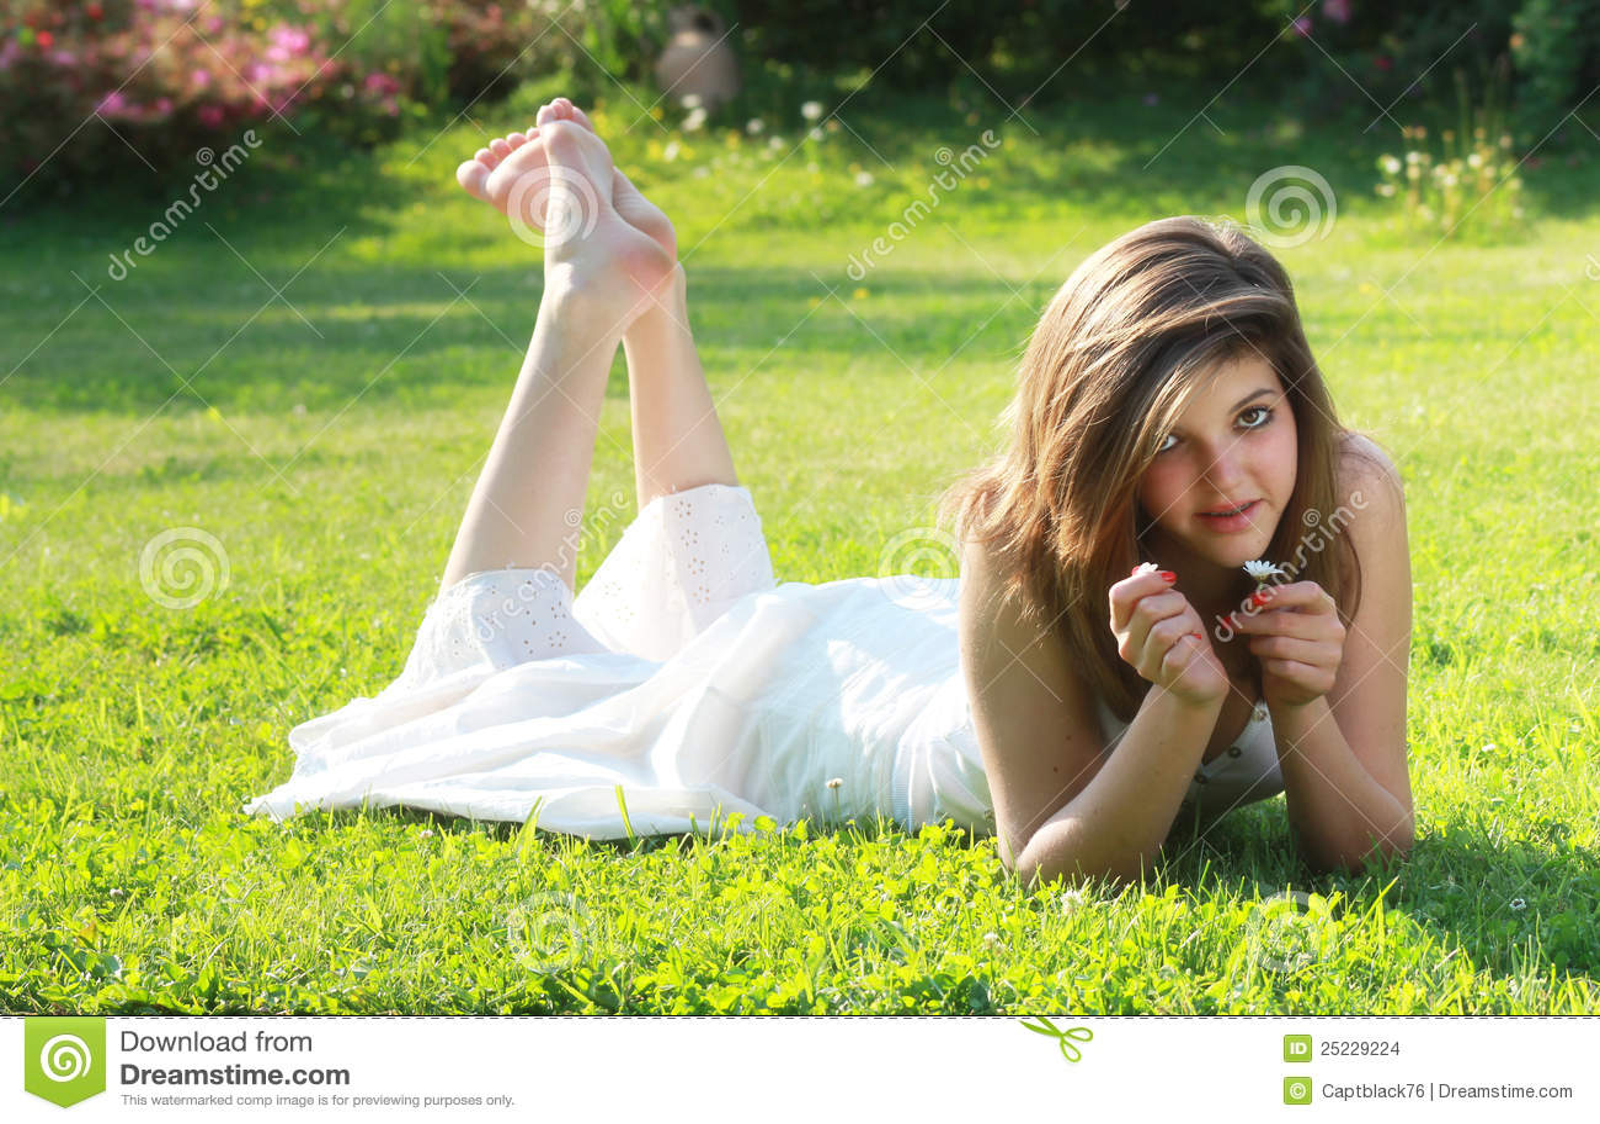 small teen nude girlxxx